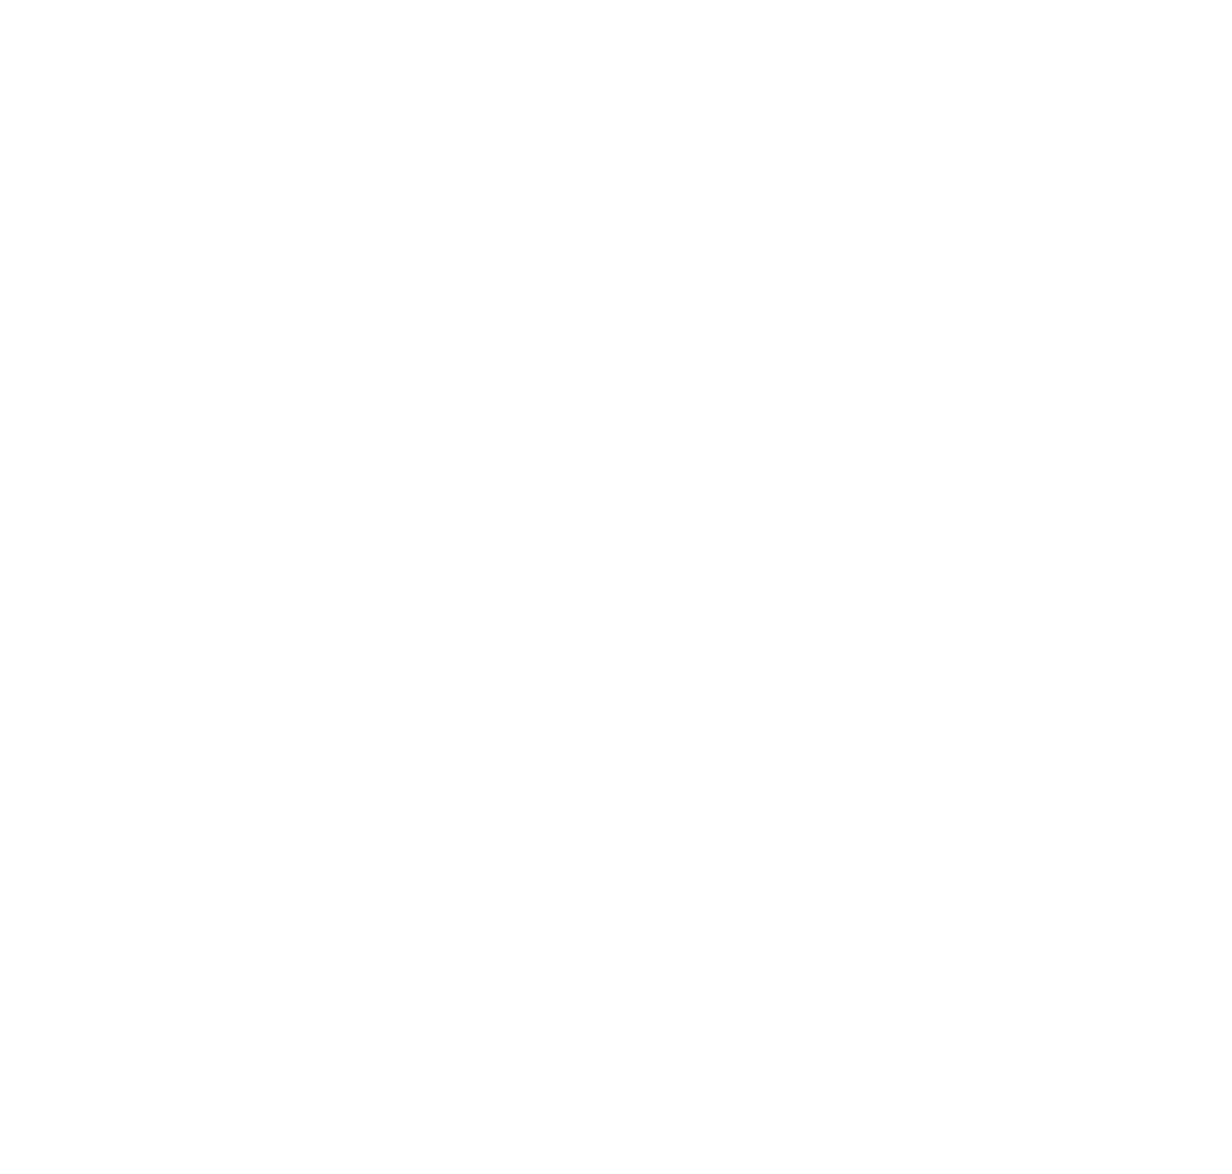 lifeisbetter